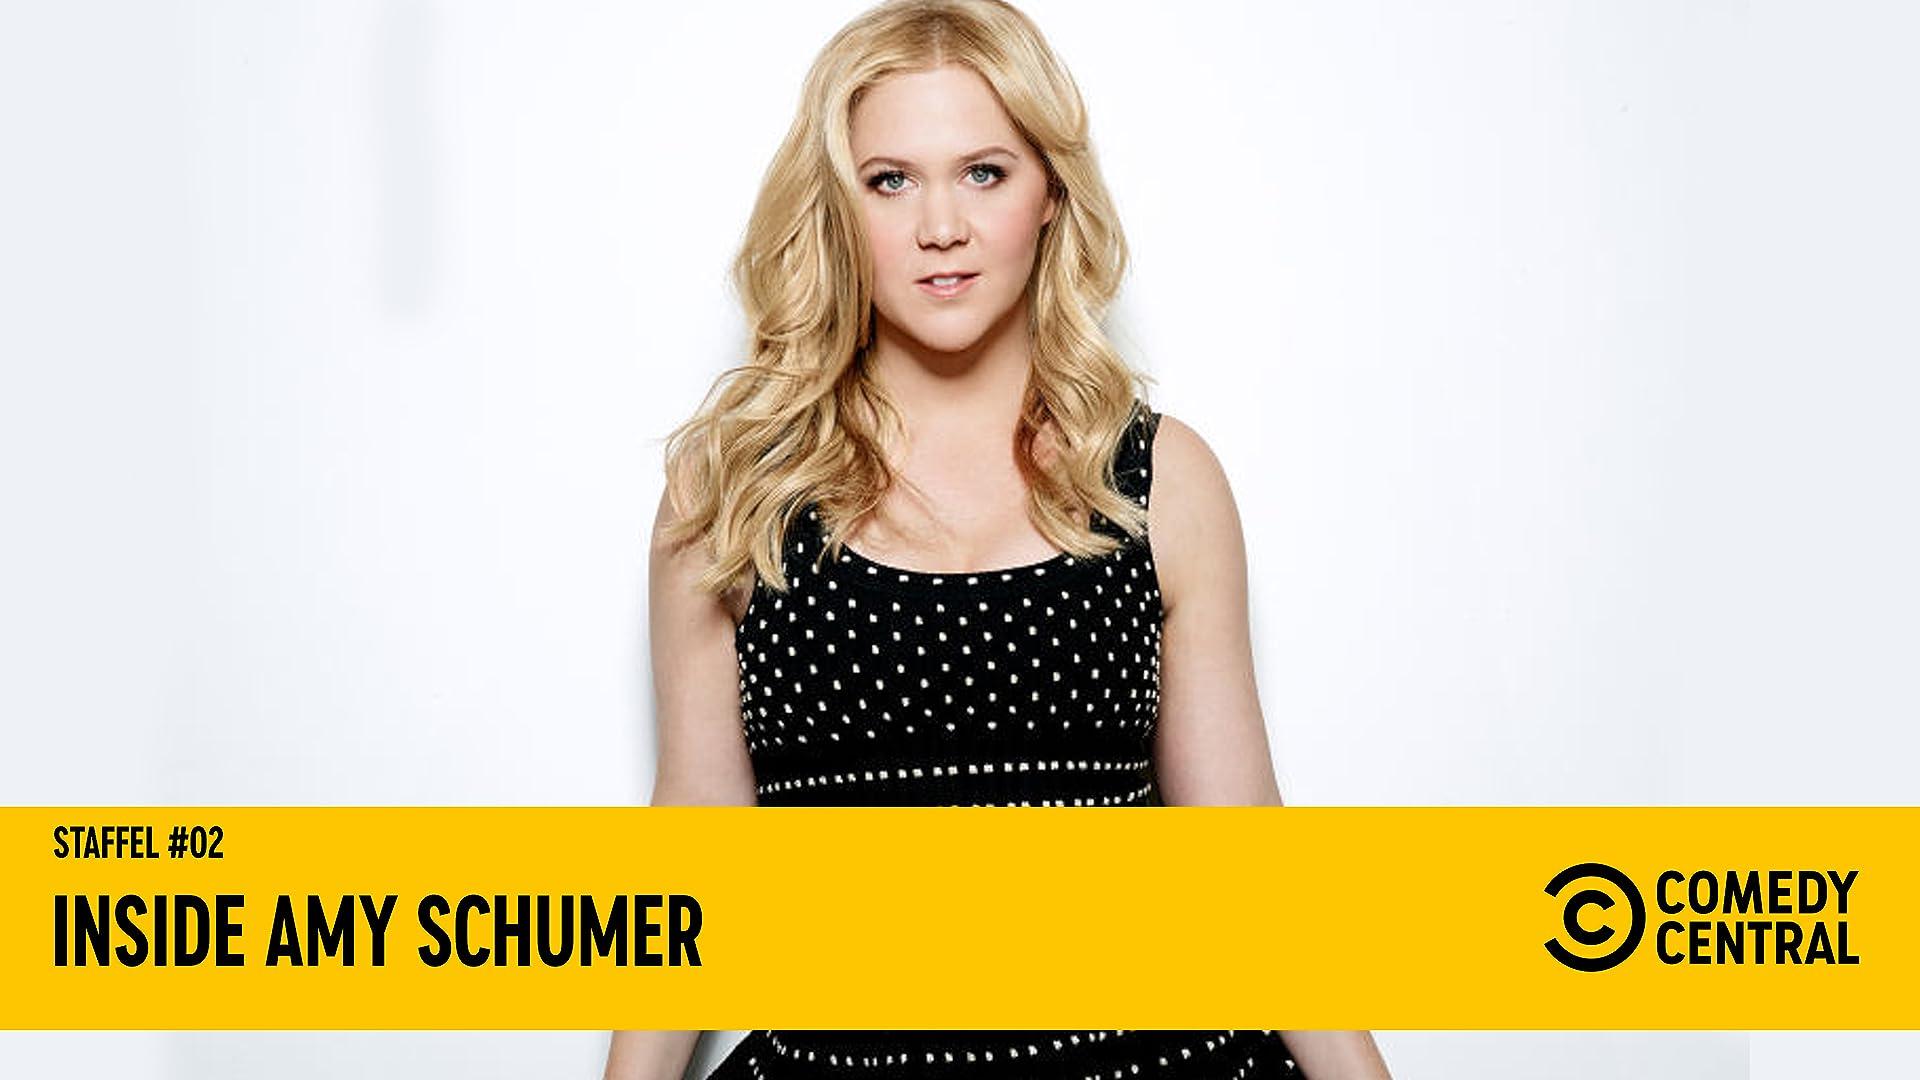 Inside Amy Schumer - Staffel 2 [dt./OV]